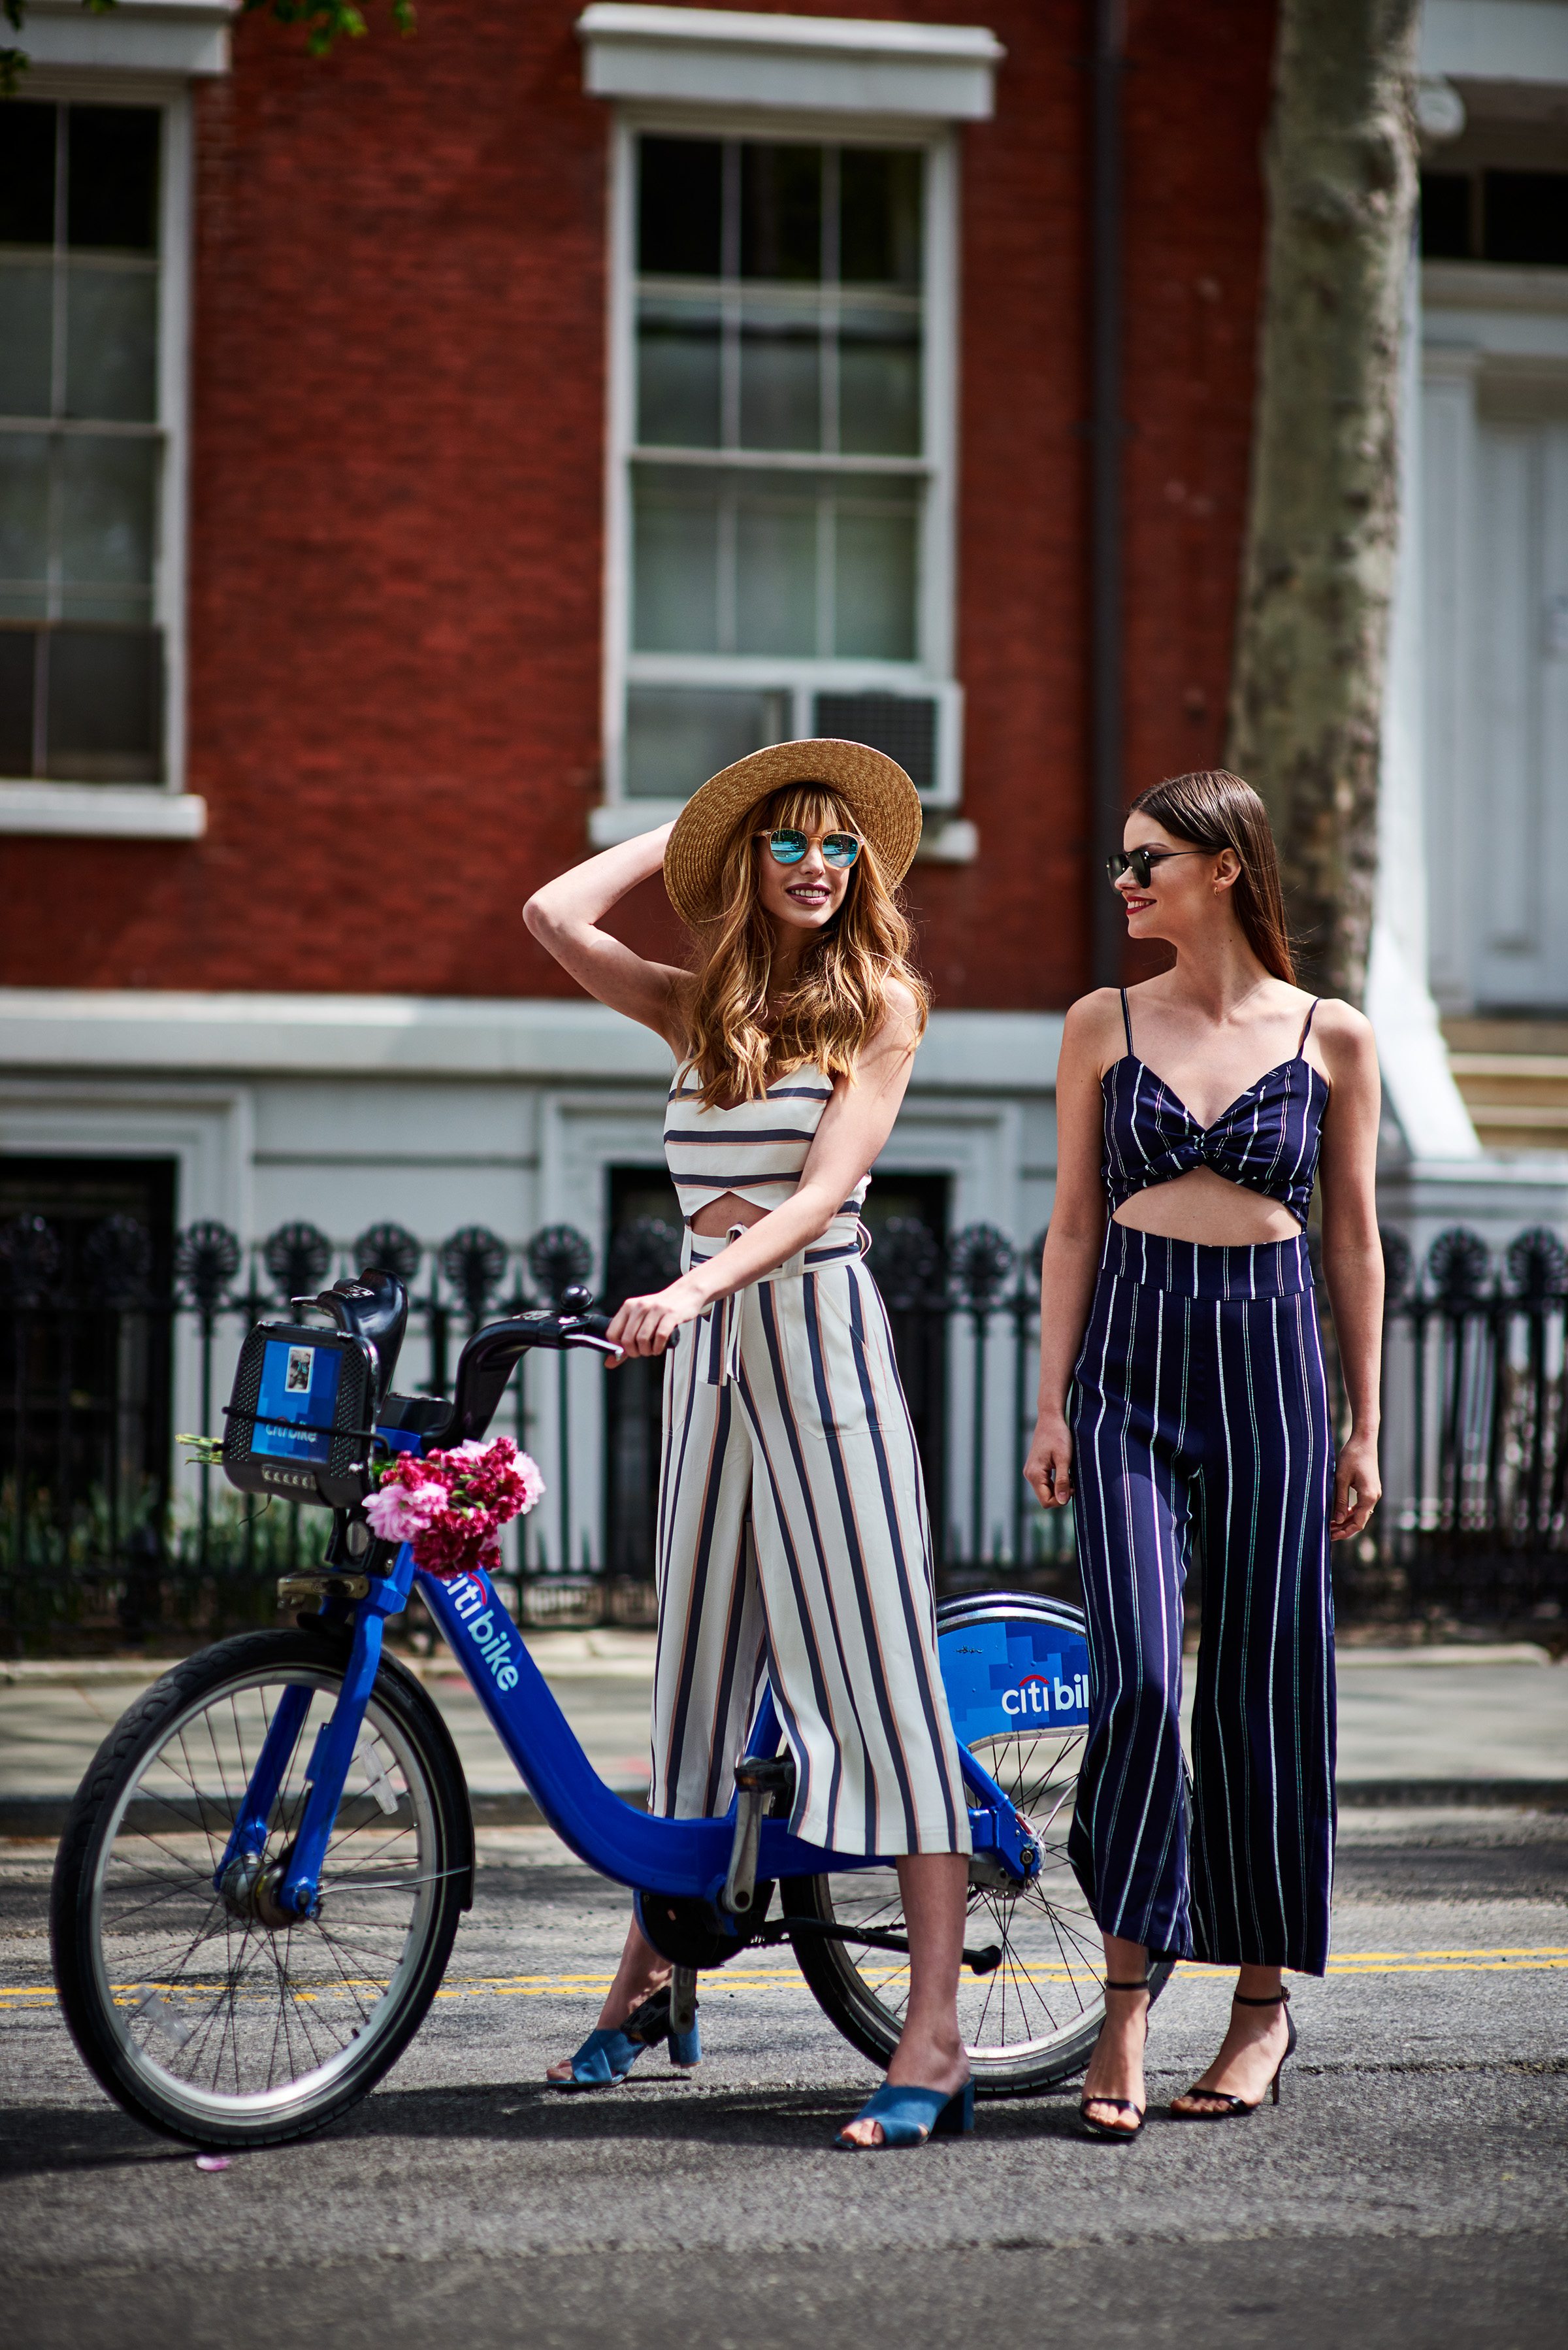 Liliana Stripe Jumpsuit & Bandwagon Sunglasses - Raw Sugar / Emily Stripe Jumpsuit & Prince Mirrored Aviator Sunglasses - Matte Black